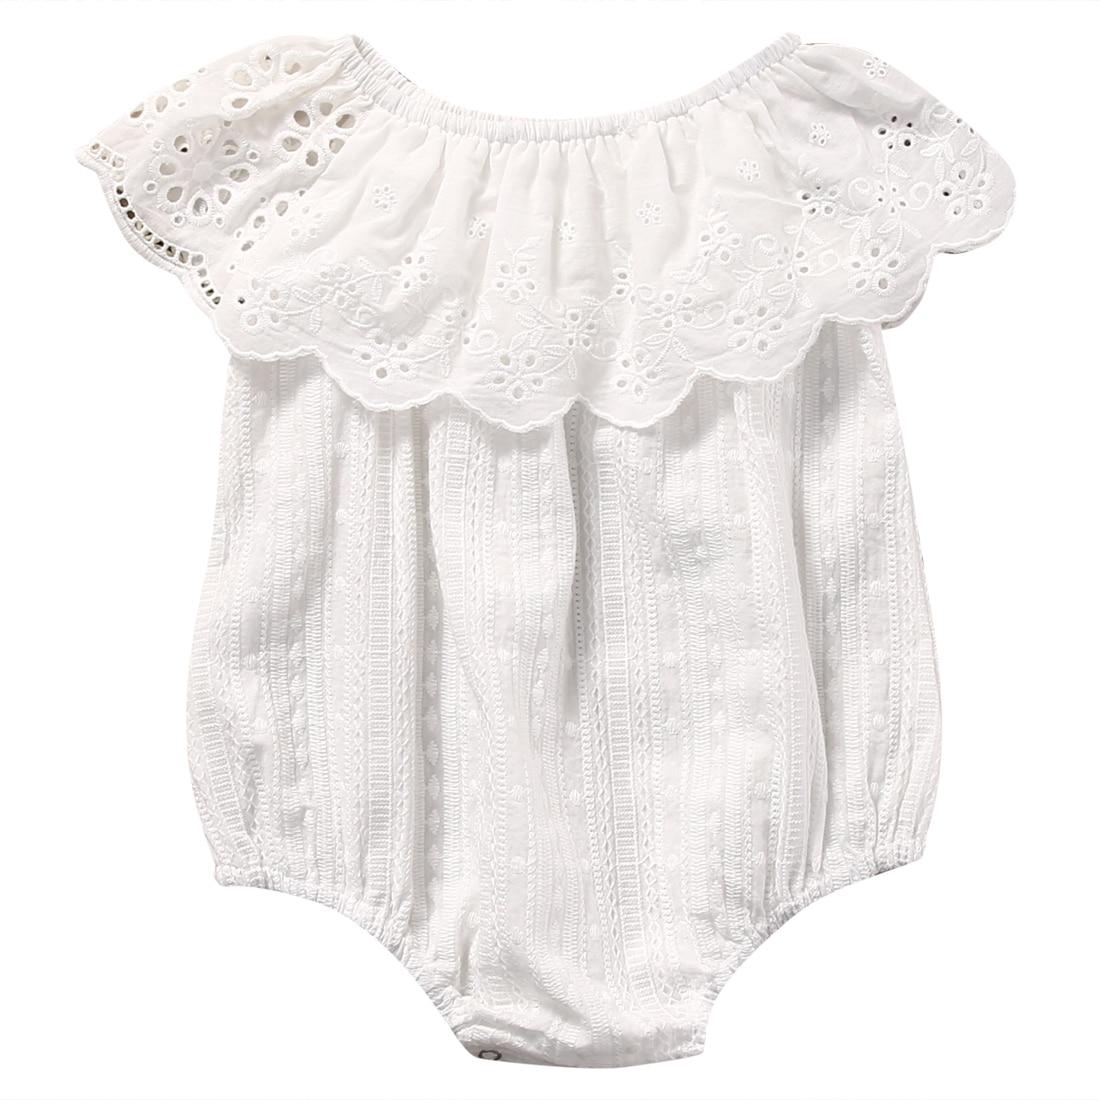 buy online 2b9cc 5f16b US $3.58 20% OFF|Nette Neugeborene Baby Strampler Kleidung Weiß Spitze  Overall Jumpsuit Outfit Sommer Bebes Sunsuit 0 24 Mt-in Strampelanzüge aus  ...